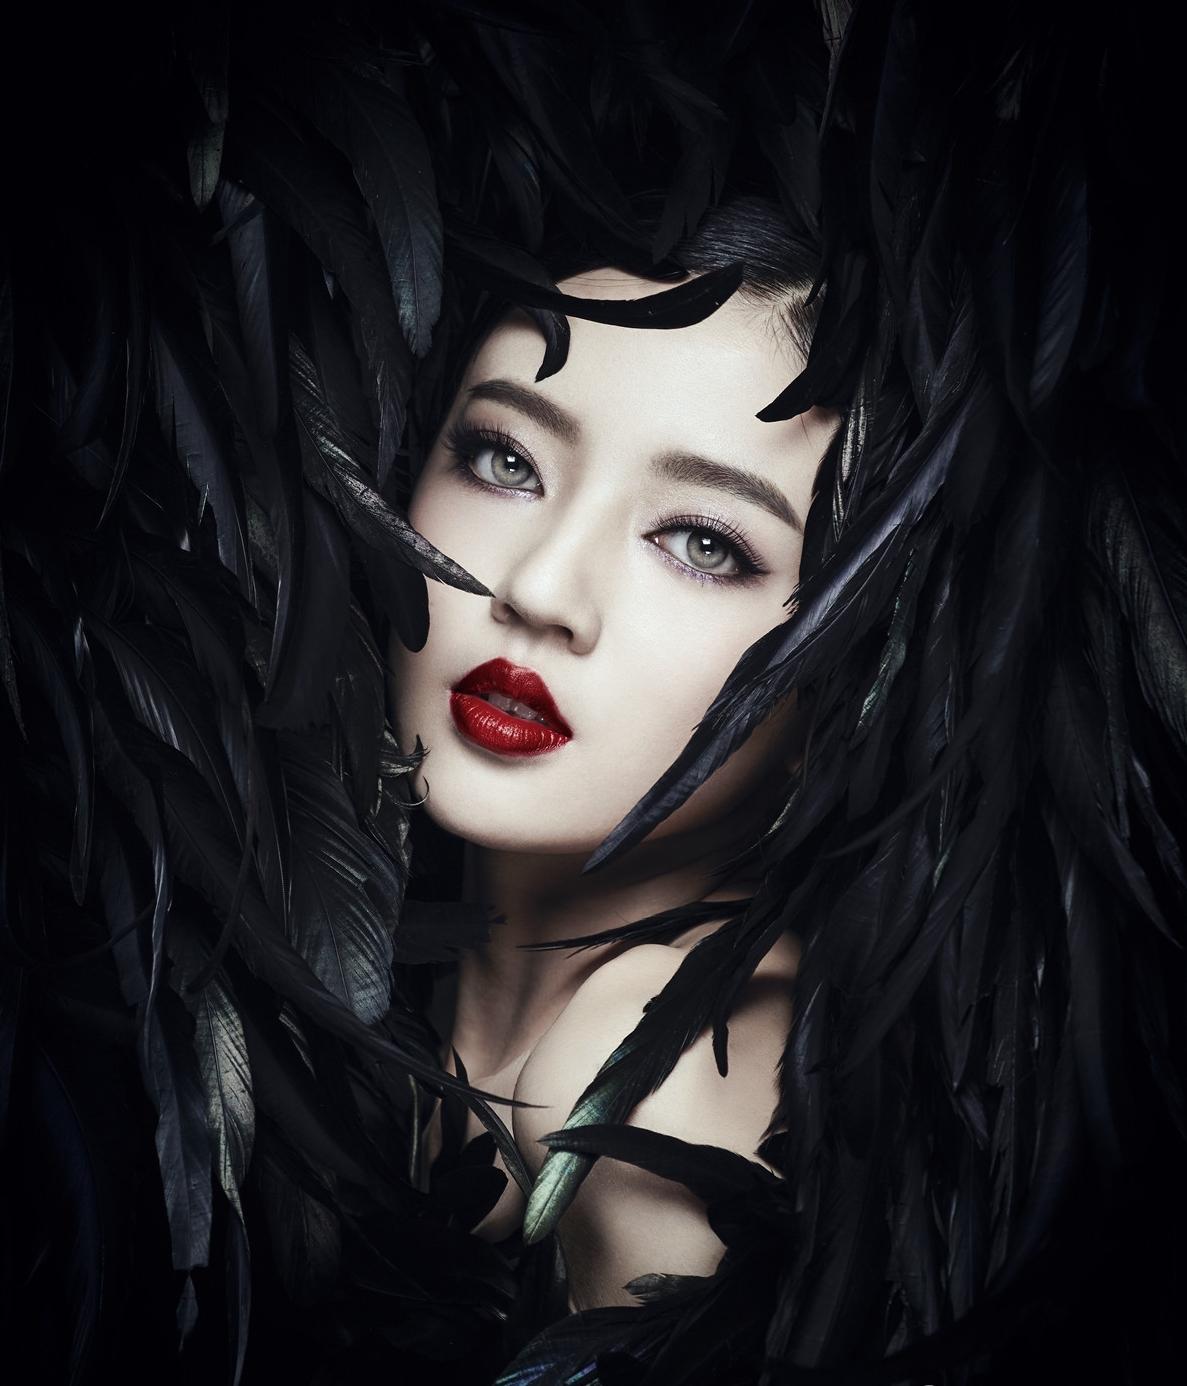 Demon girl nsfw photo